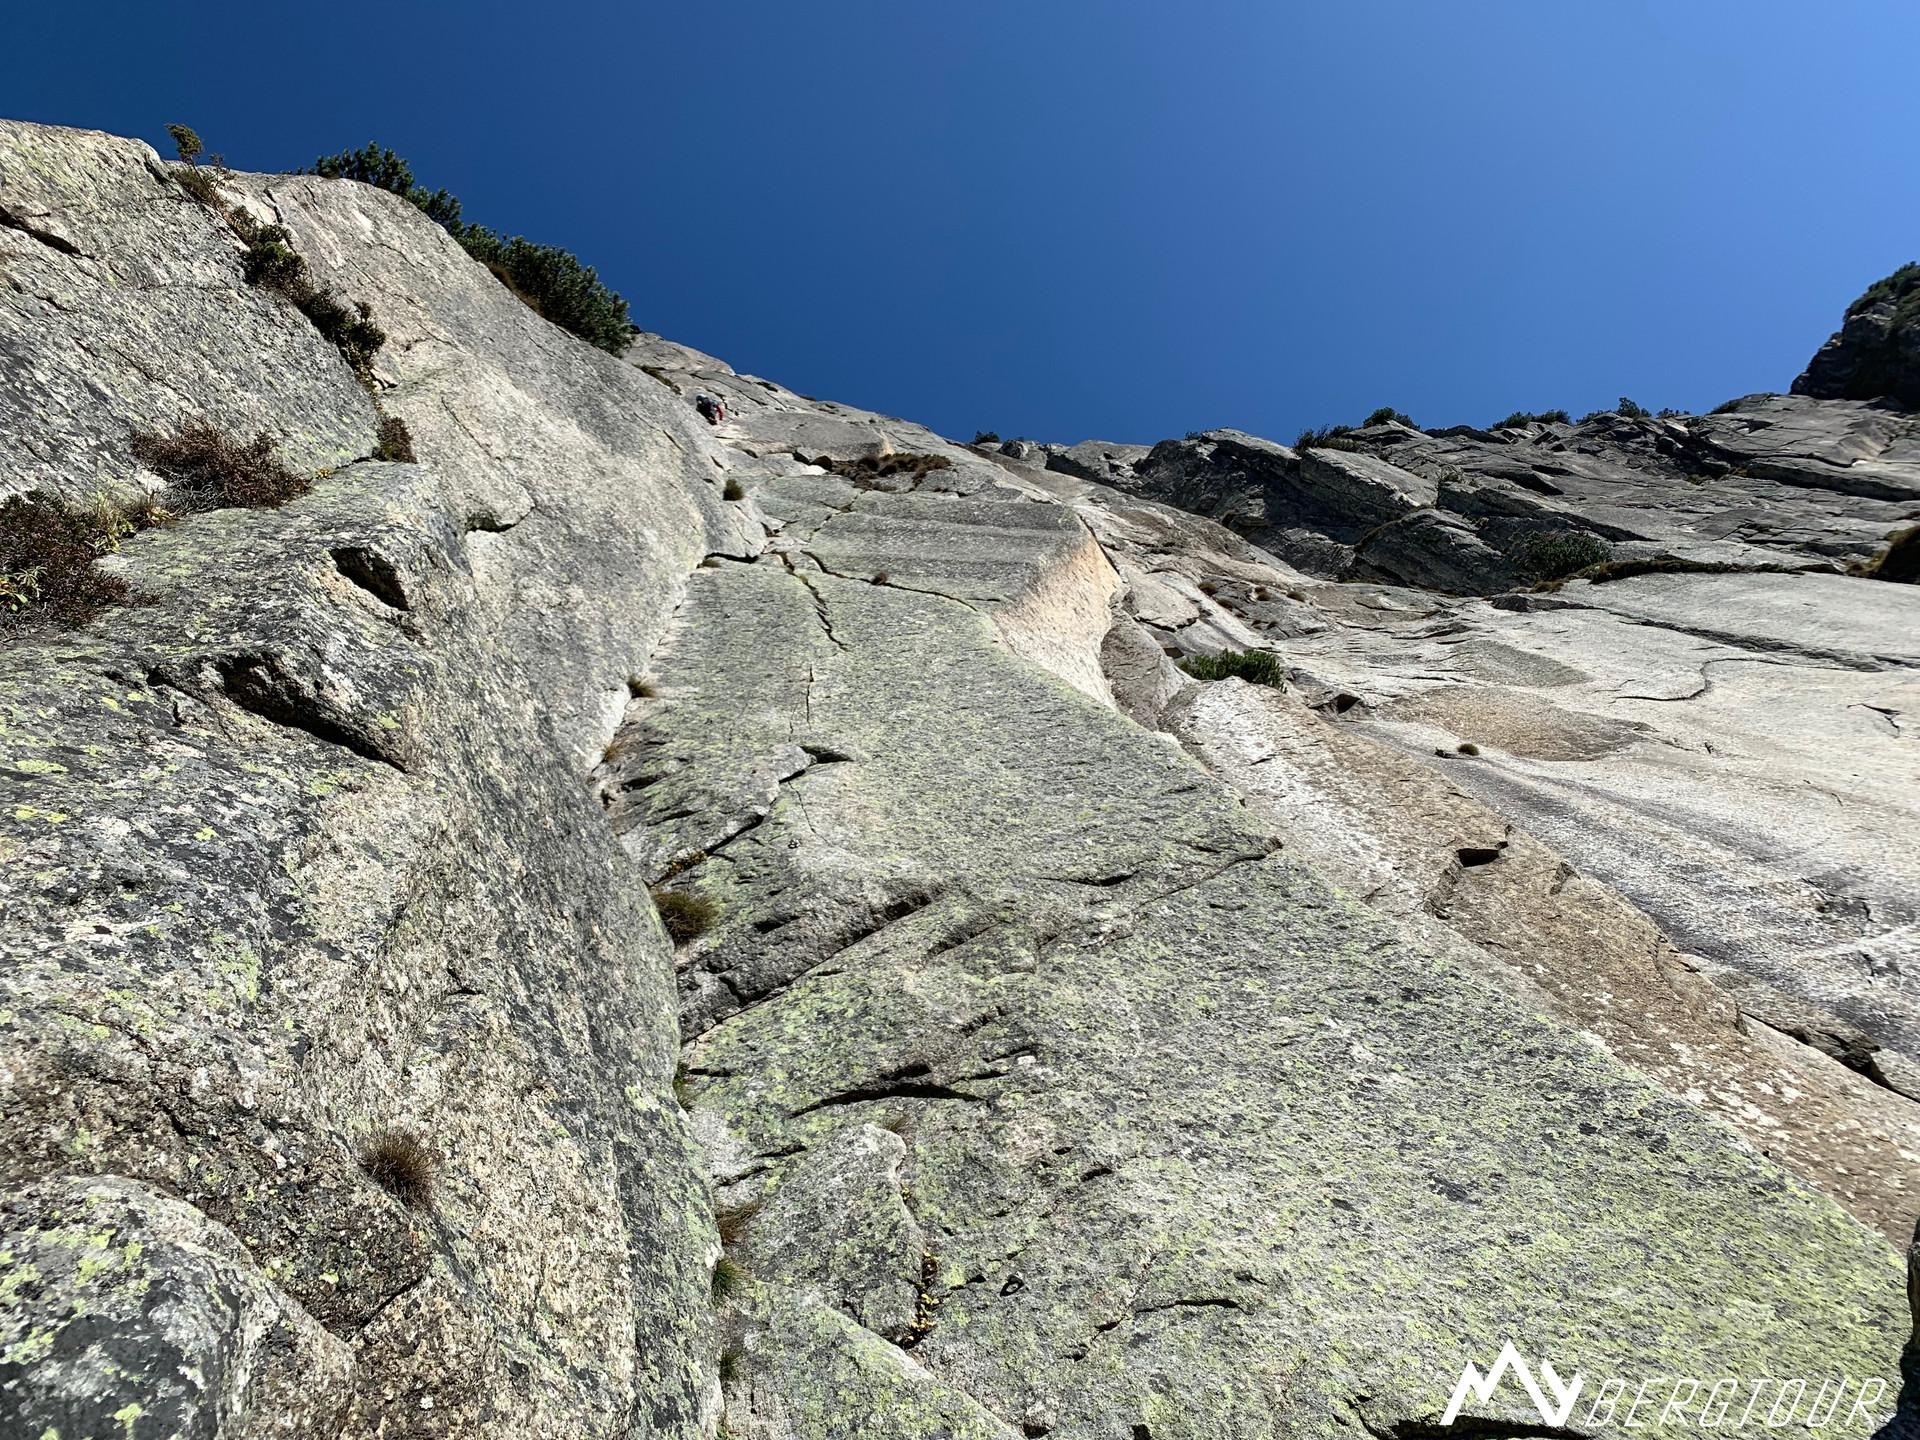 Teufelstalwand Klettern Im Zeichen der Freundschaft mybergtour Verschneidung